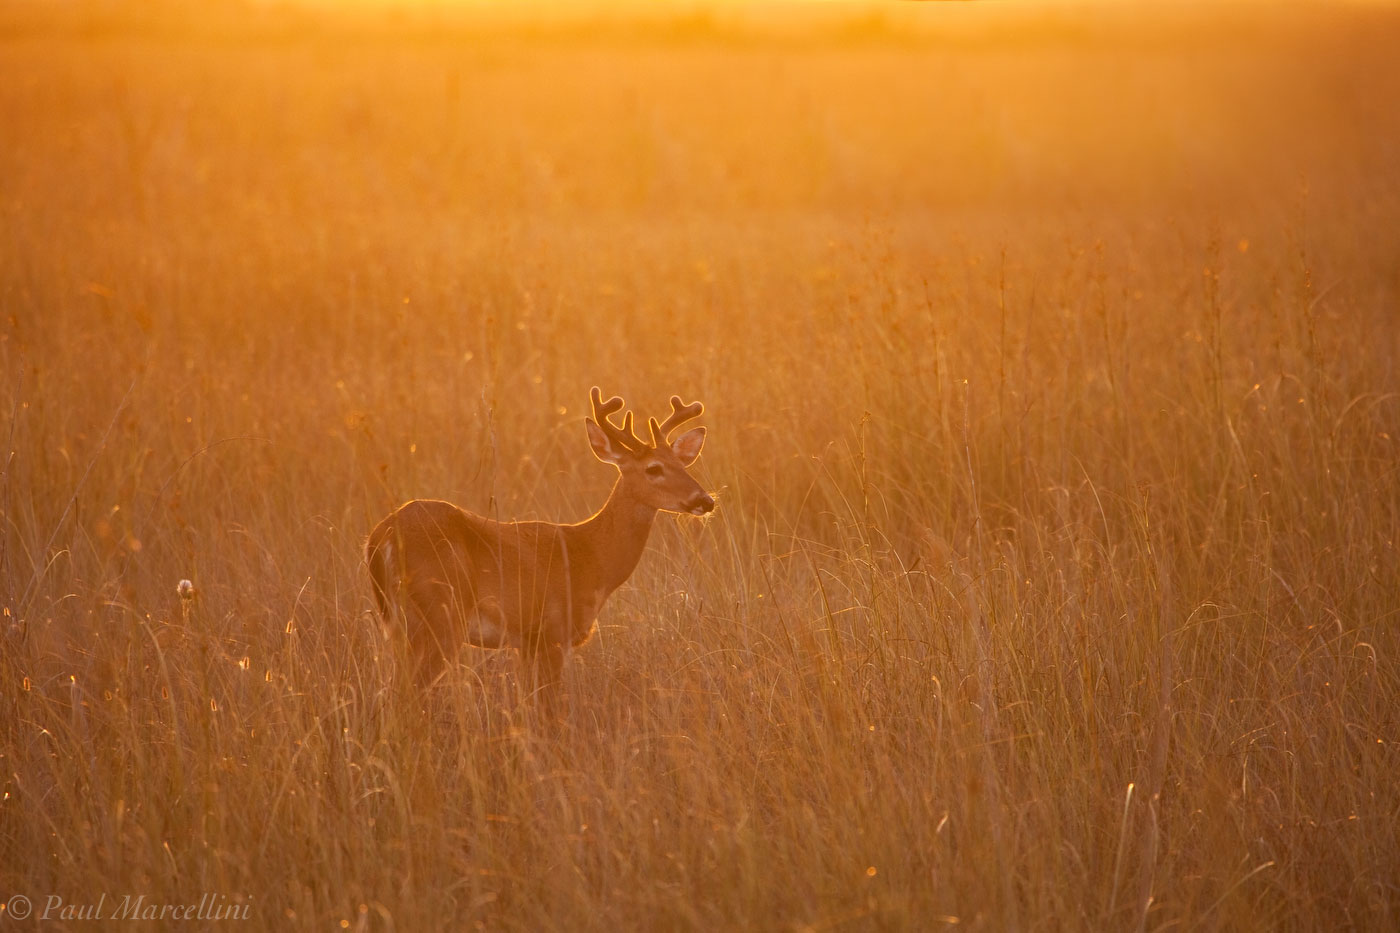 Odocoileus virginianus, everglades national park, white-tailed deer, velvet, deer, photo